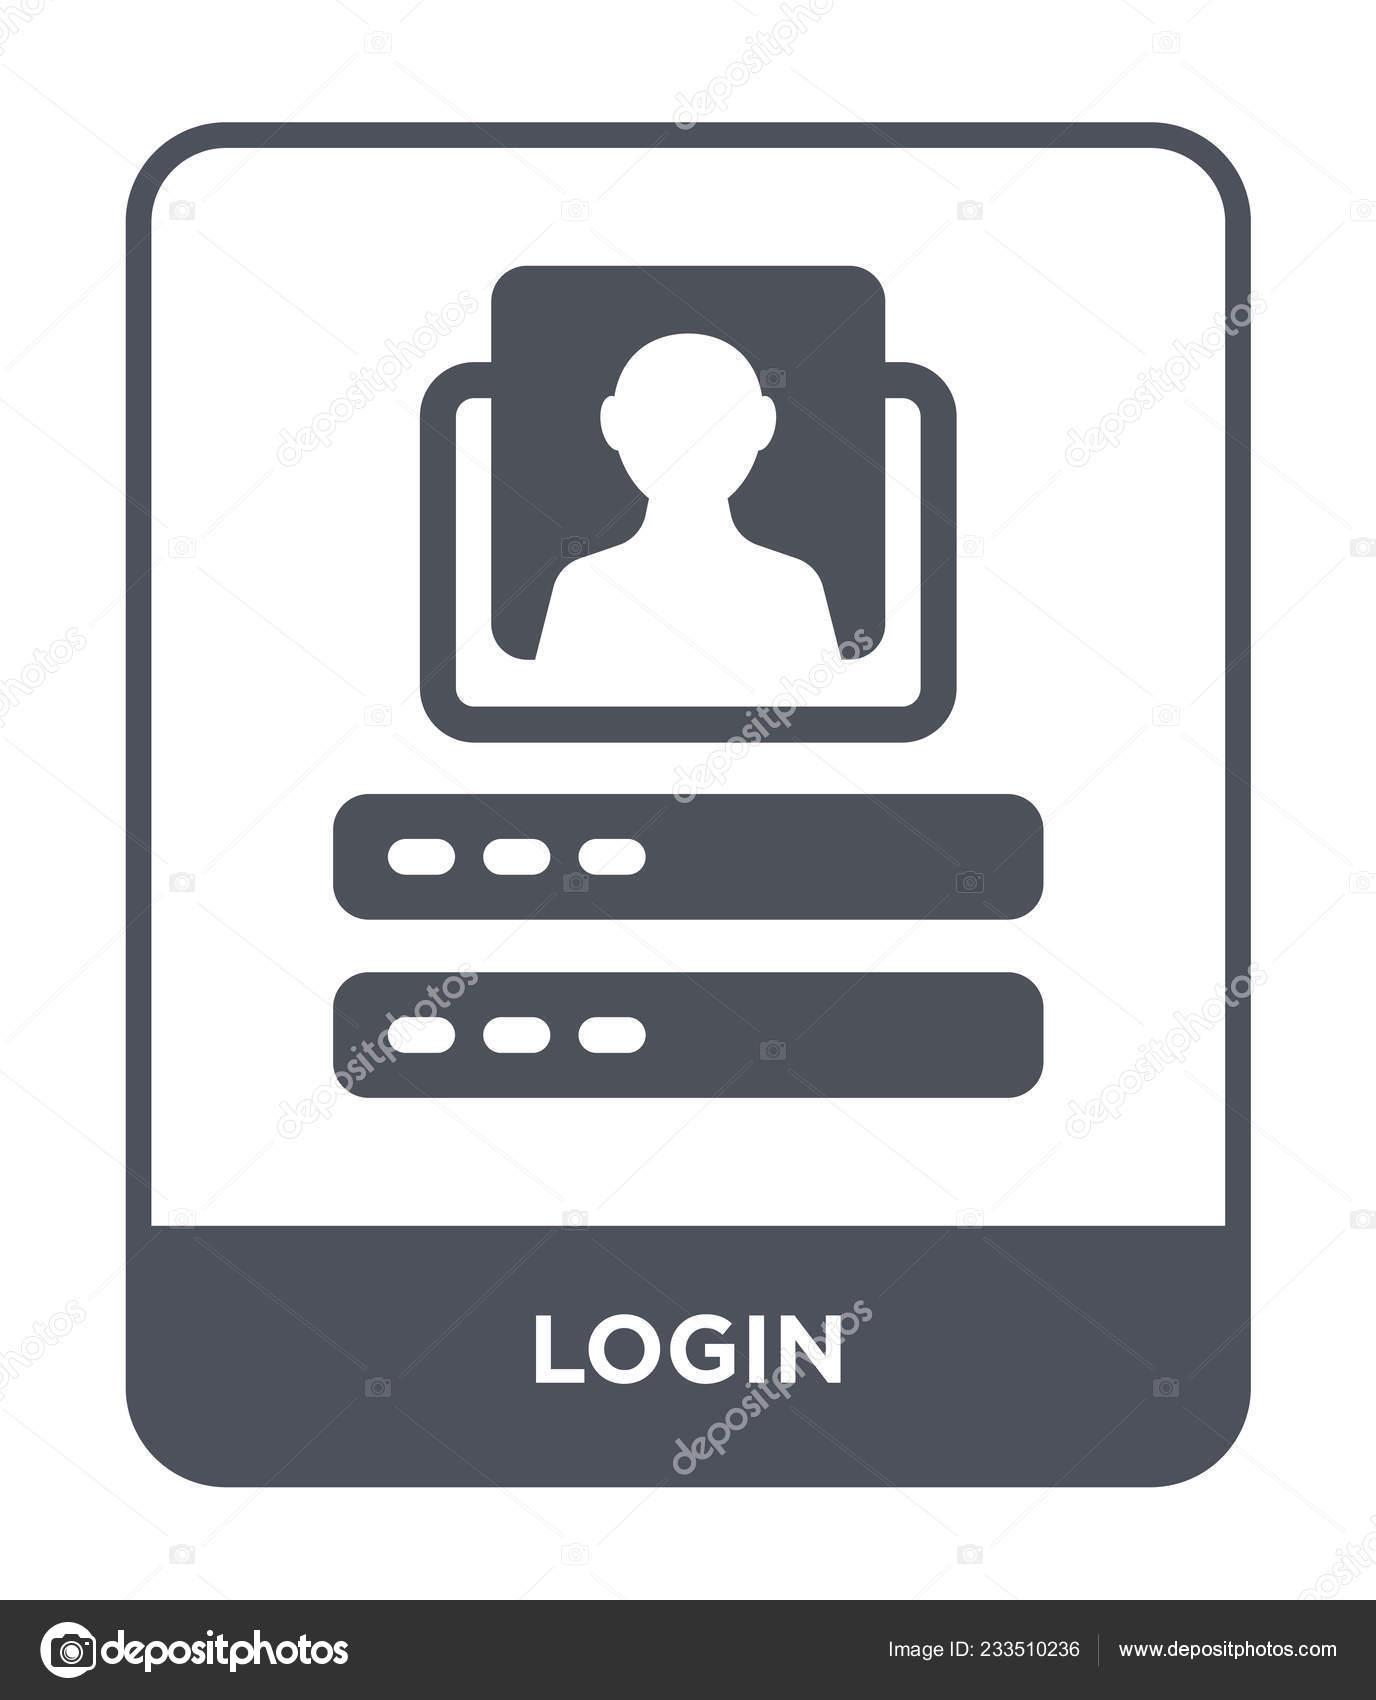 Login Icon Trendy Design Style Login Icon Isolated White